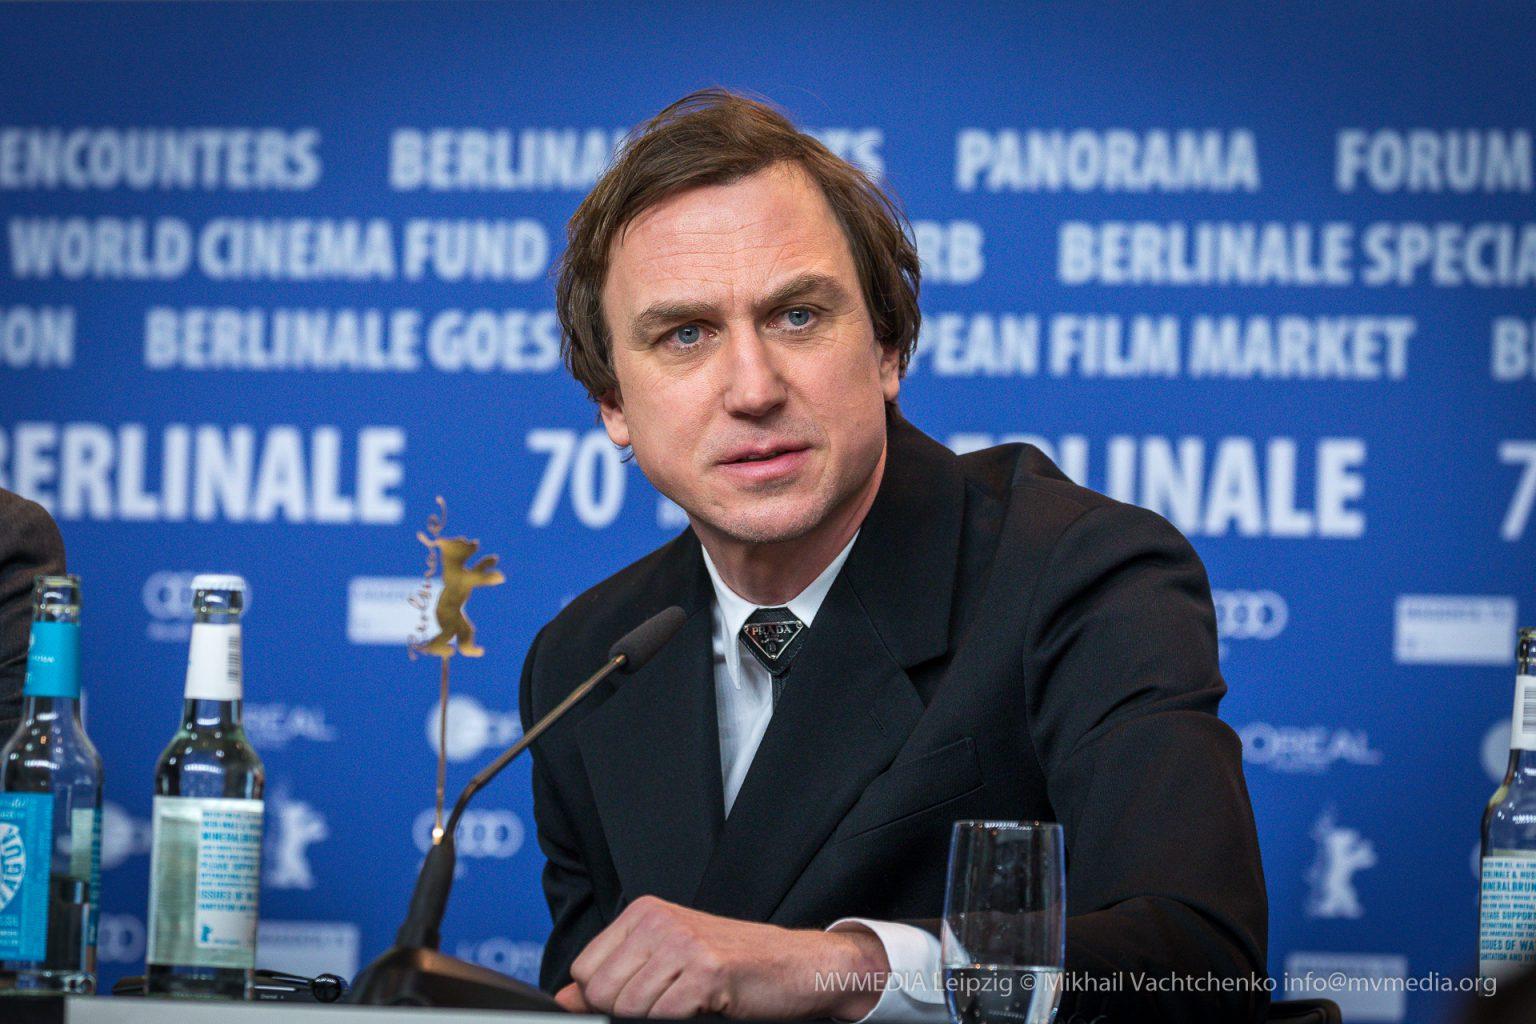 Lars Eidinger Pressekonferenz Berlinale Persian Lessons